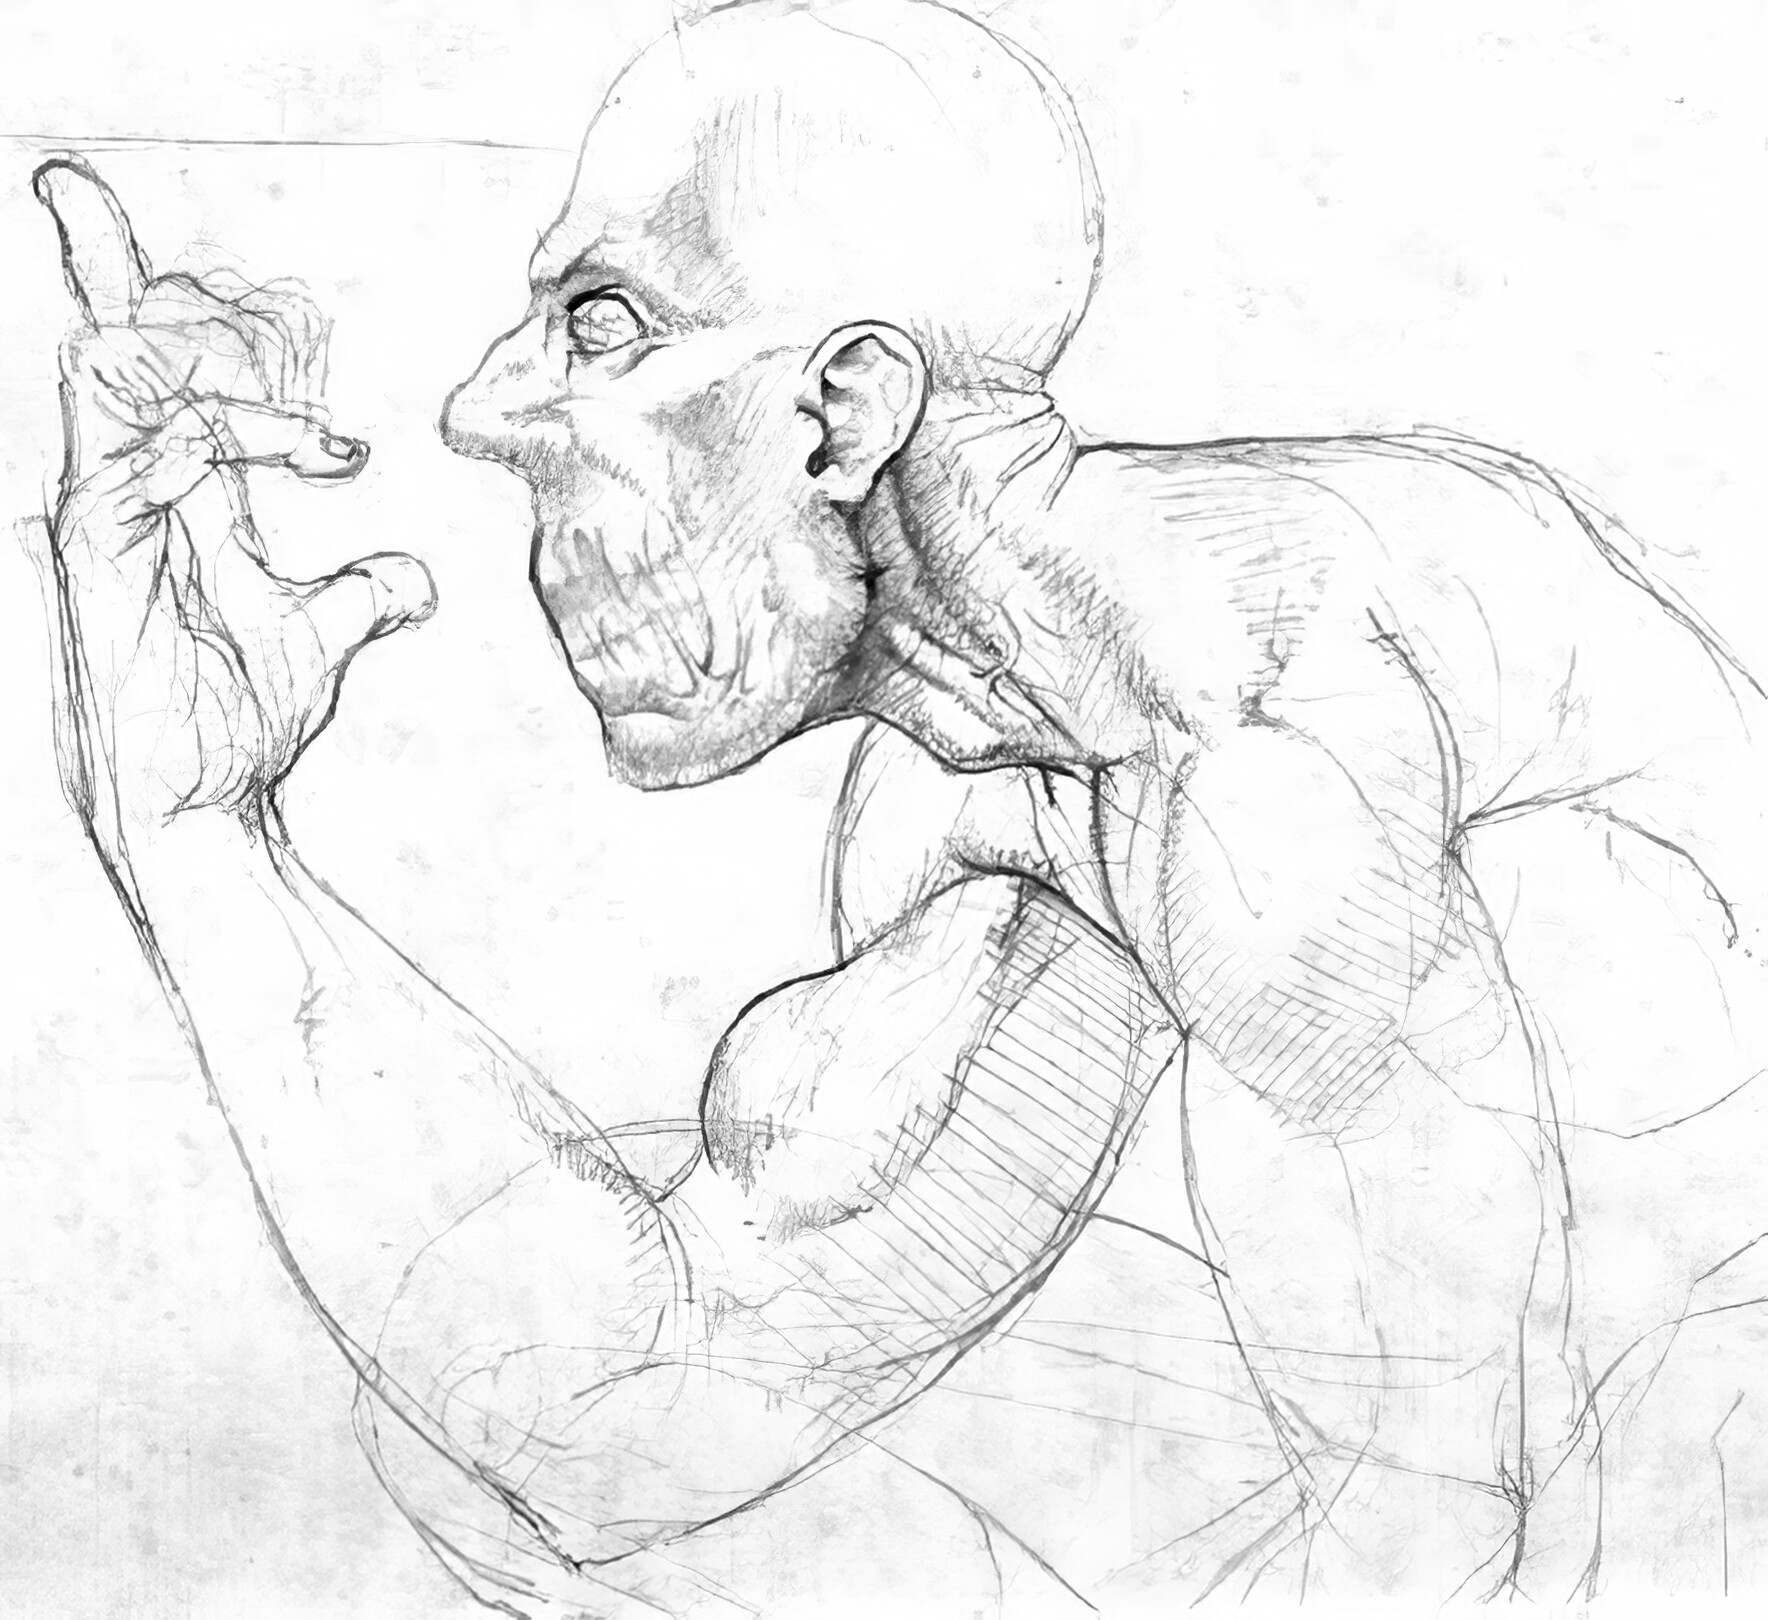 William furneaux uprezsandman sketch edit